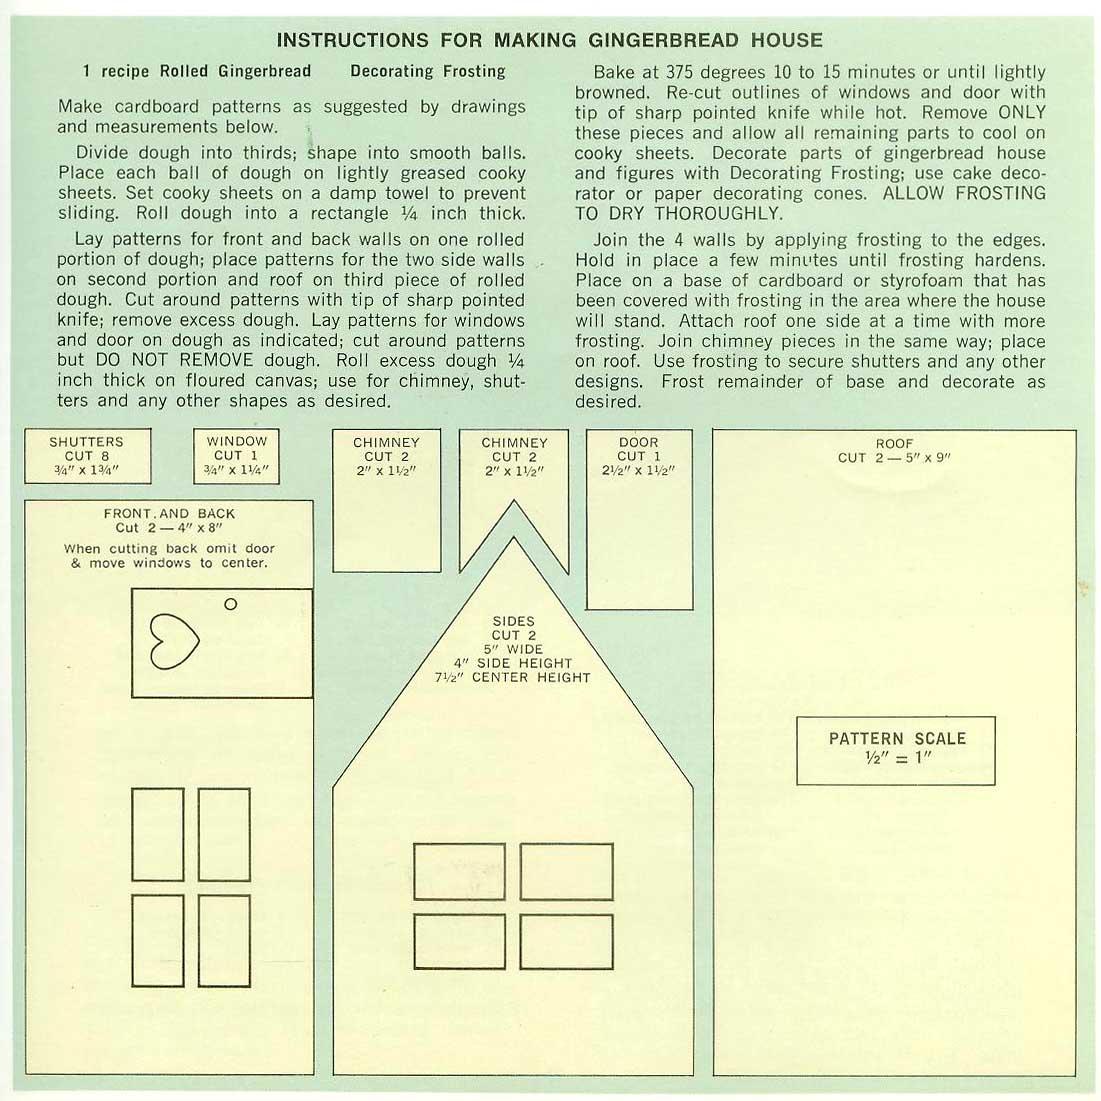 Gingerbread House Recipe & Pattern